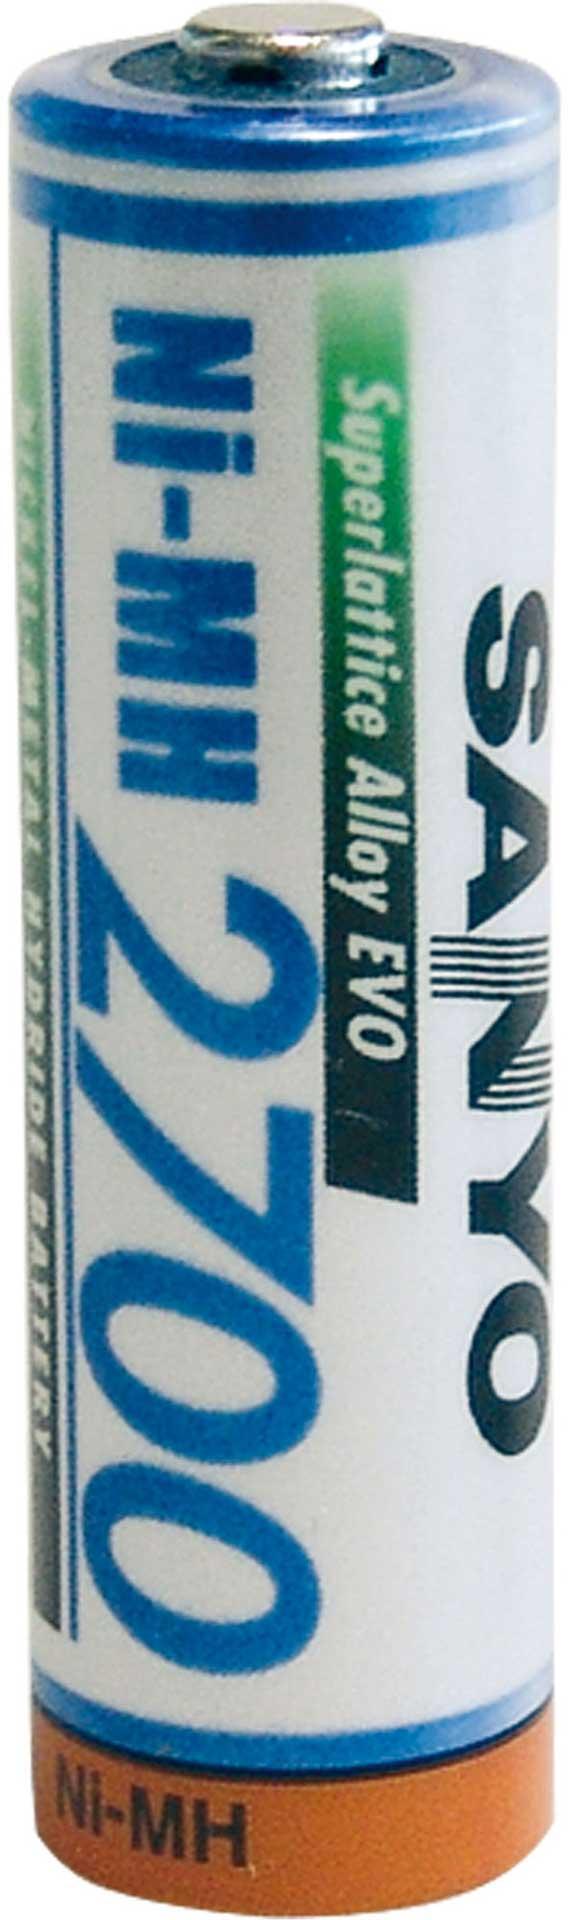 PANASONIC NI-MH EINZELZELLE 1,2 VOLT 2700 MAH